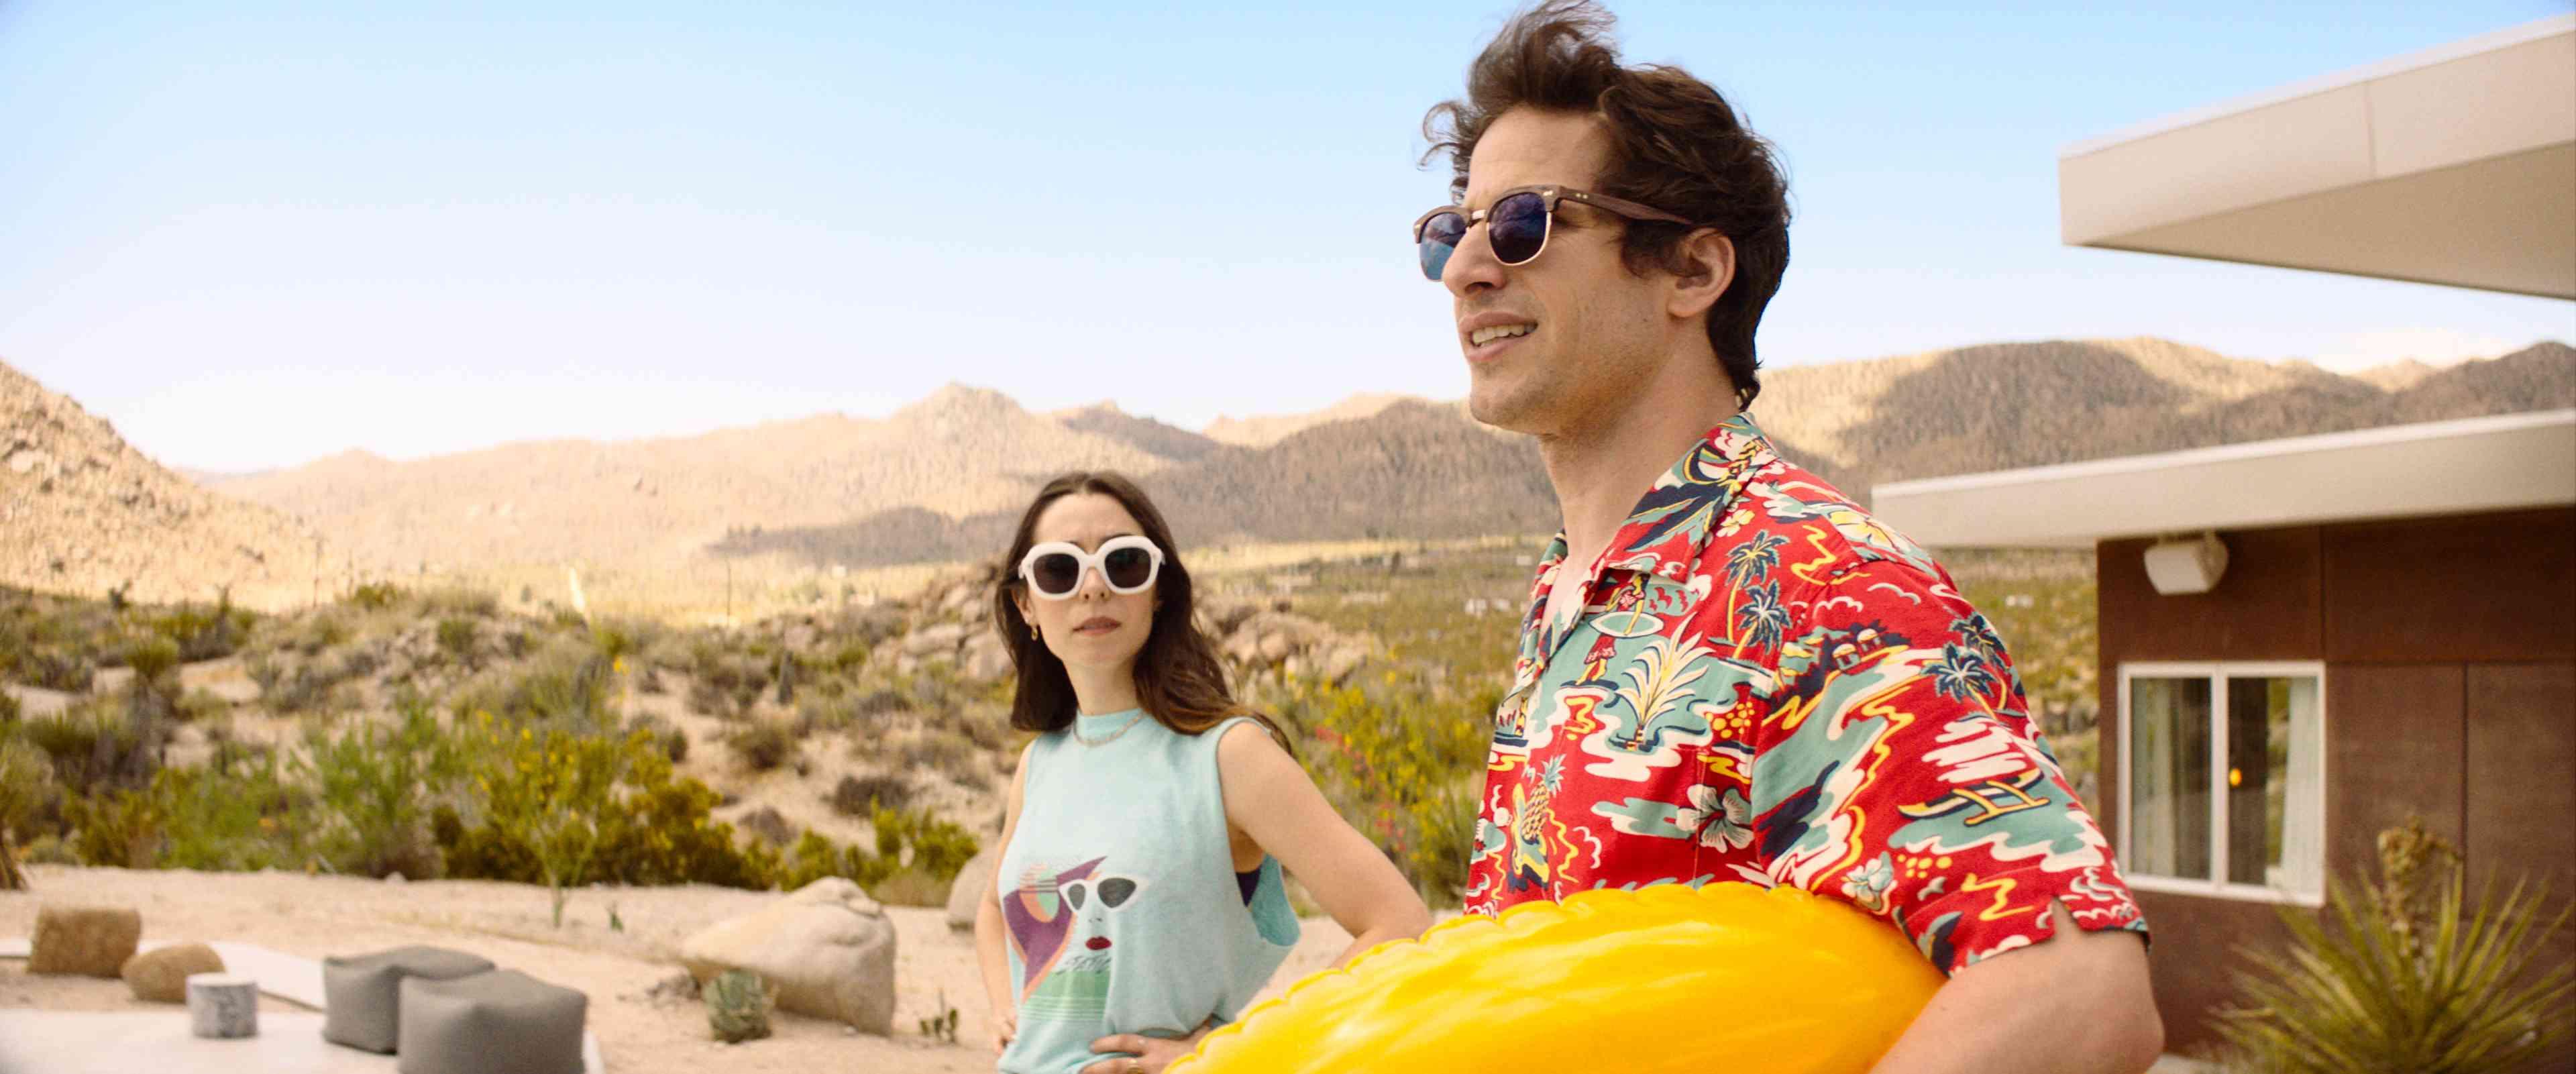 Andy Samberg and Cristin Millioti in Palm Springs